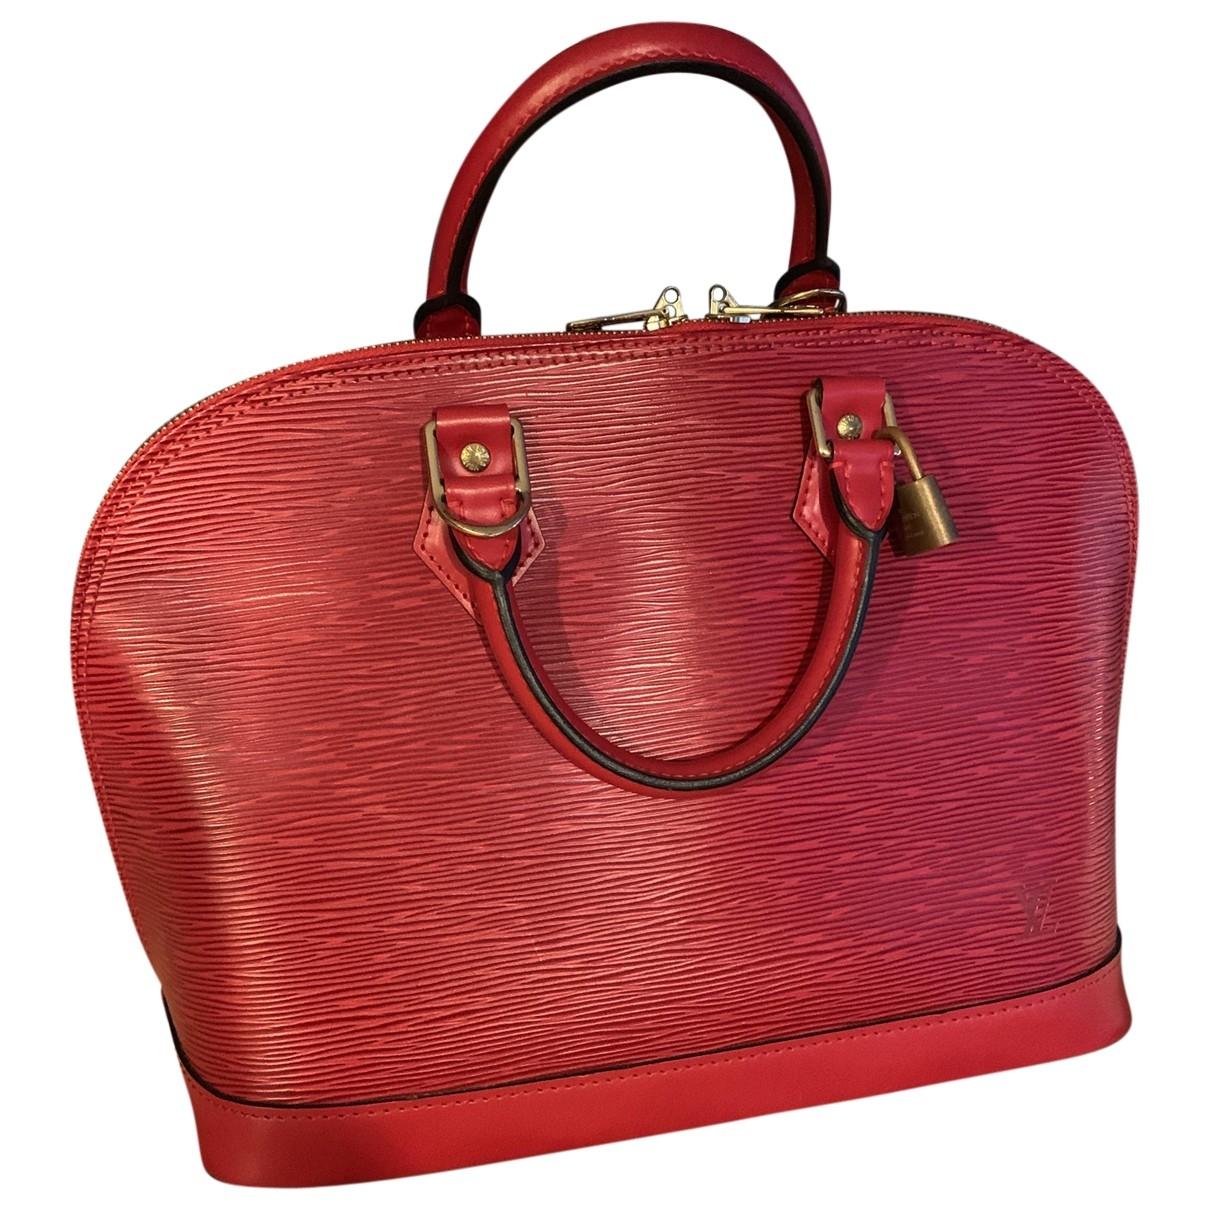 Louis Vuitton Alma Handtasche in  Rot Leder